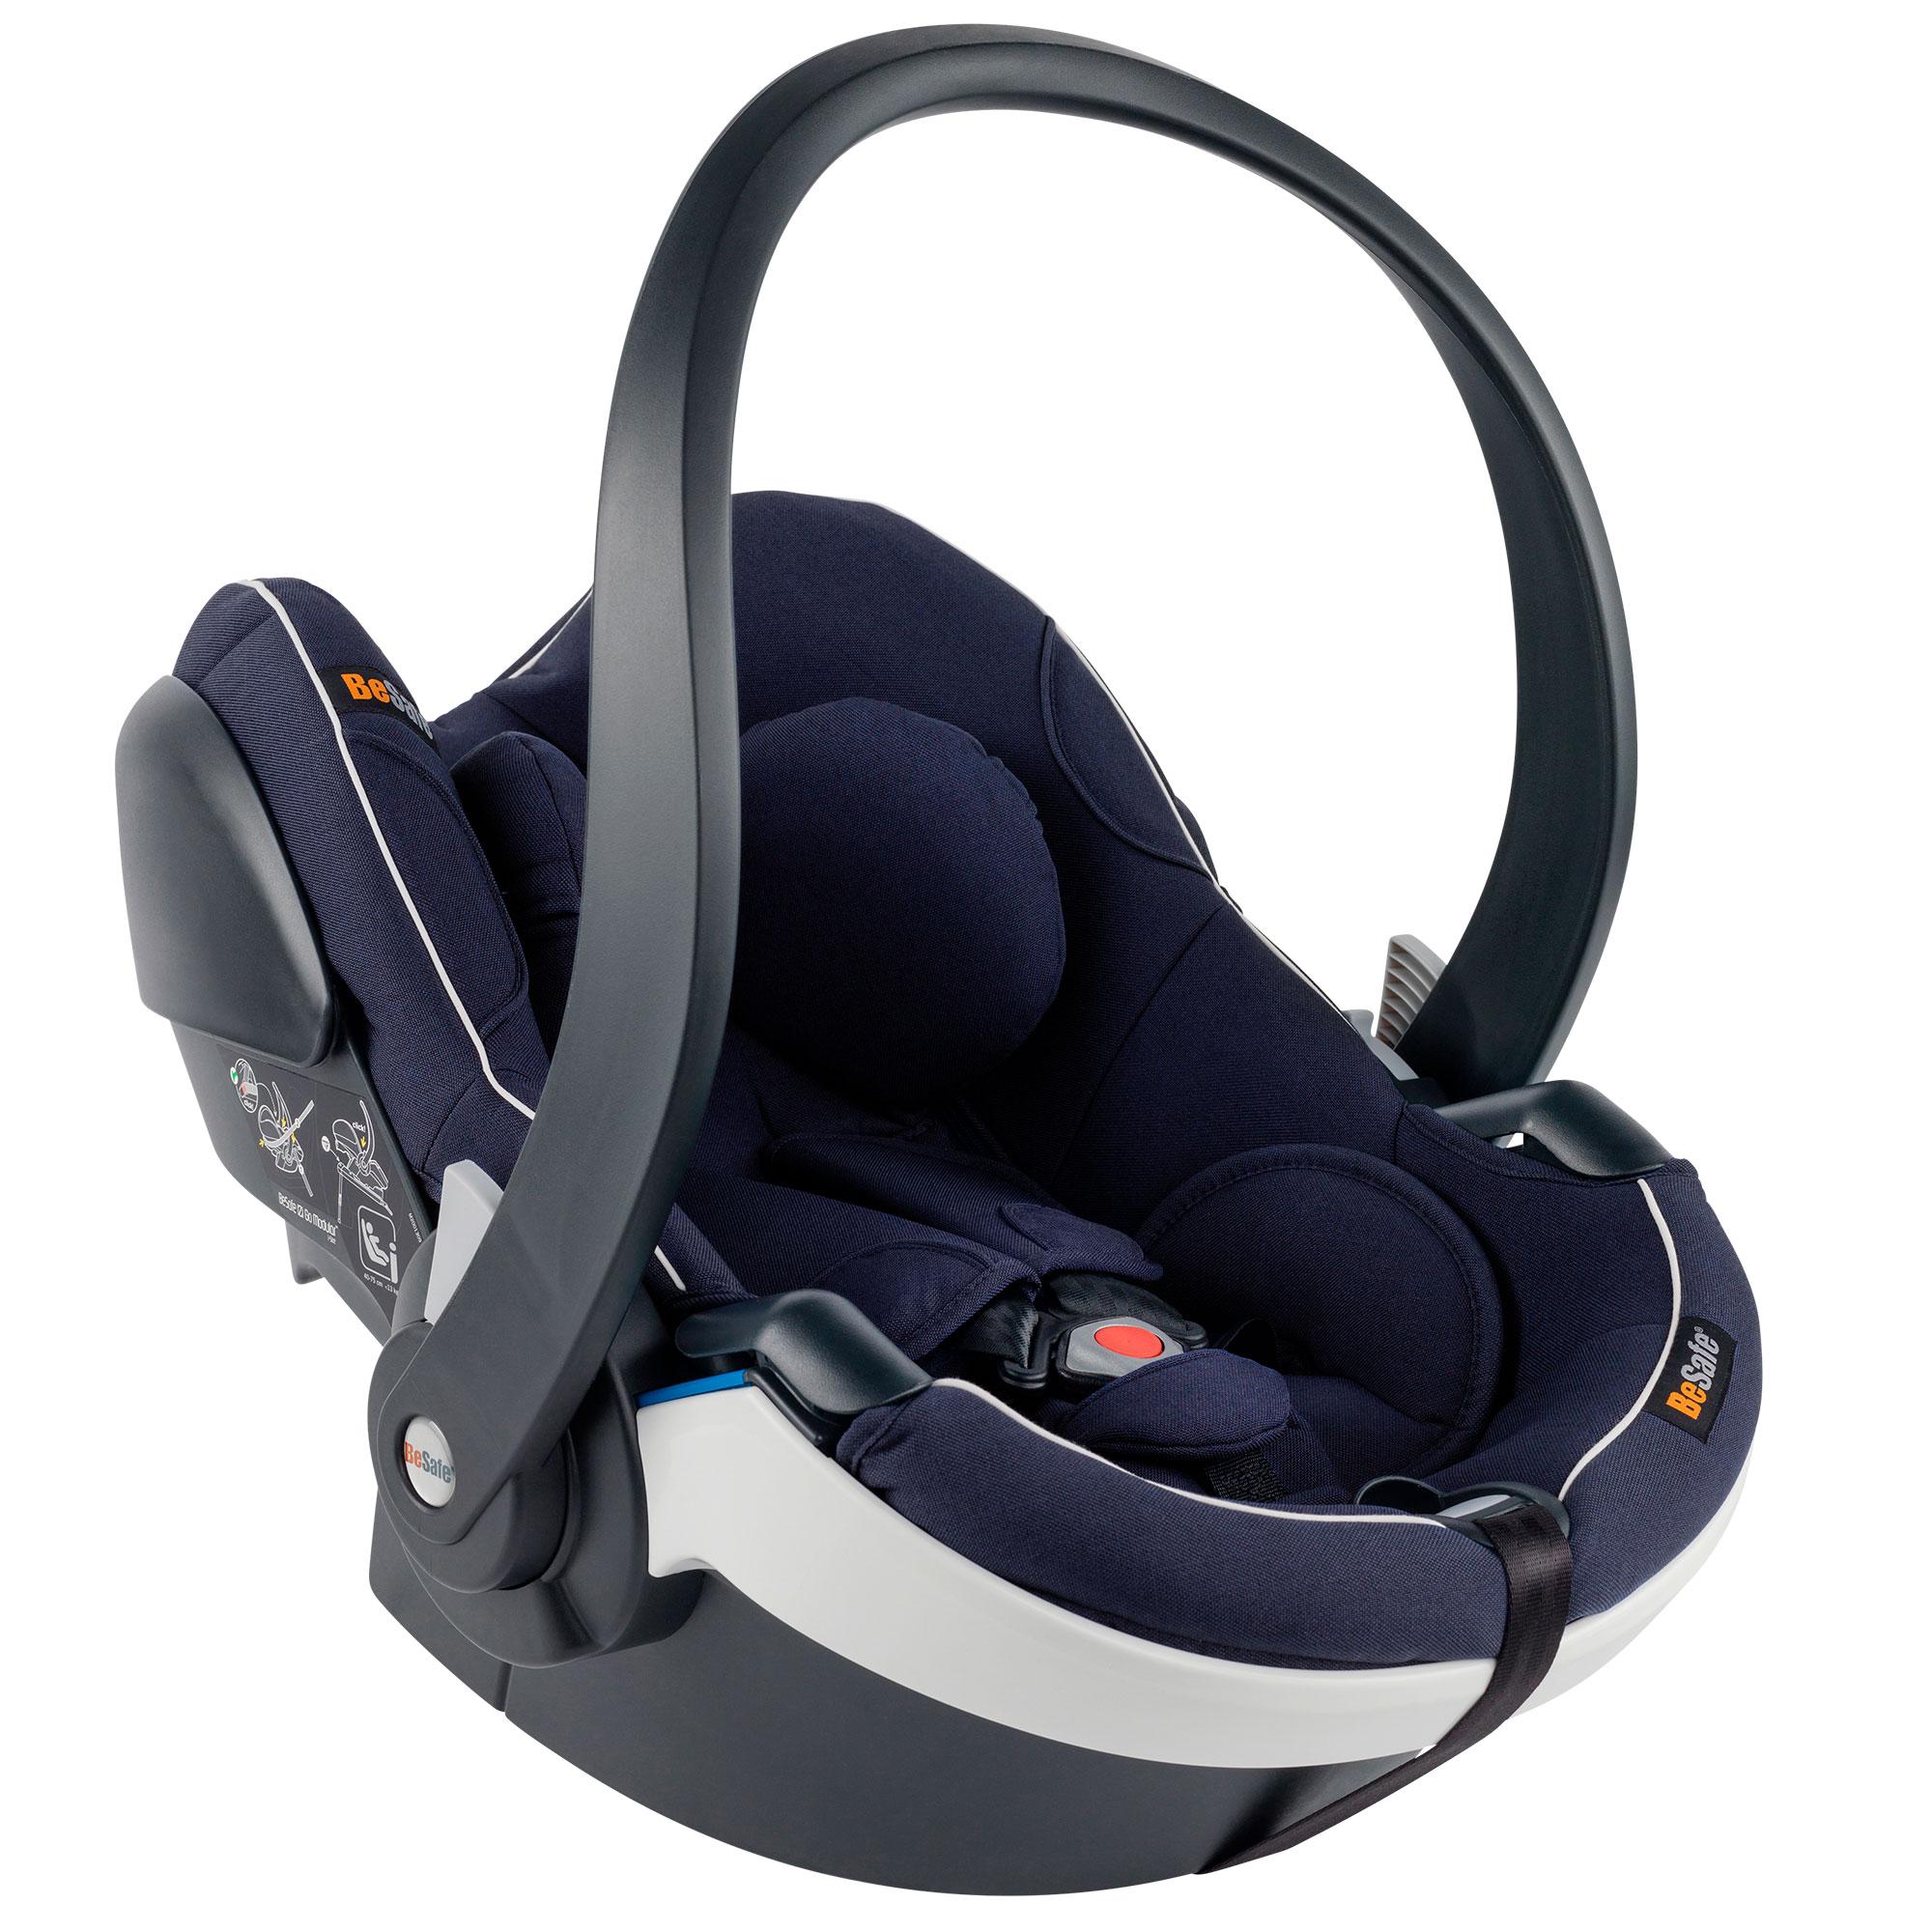 3e1f157e351 Baby car seat BeSafe iZi Modular i-Size